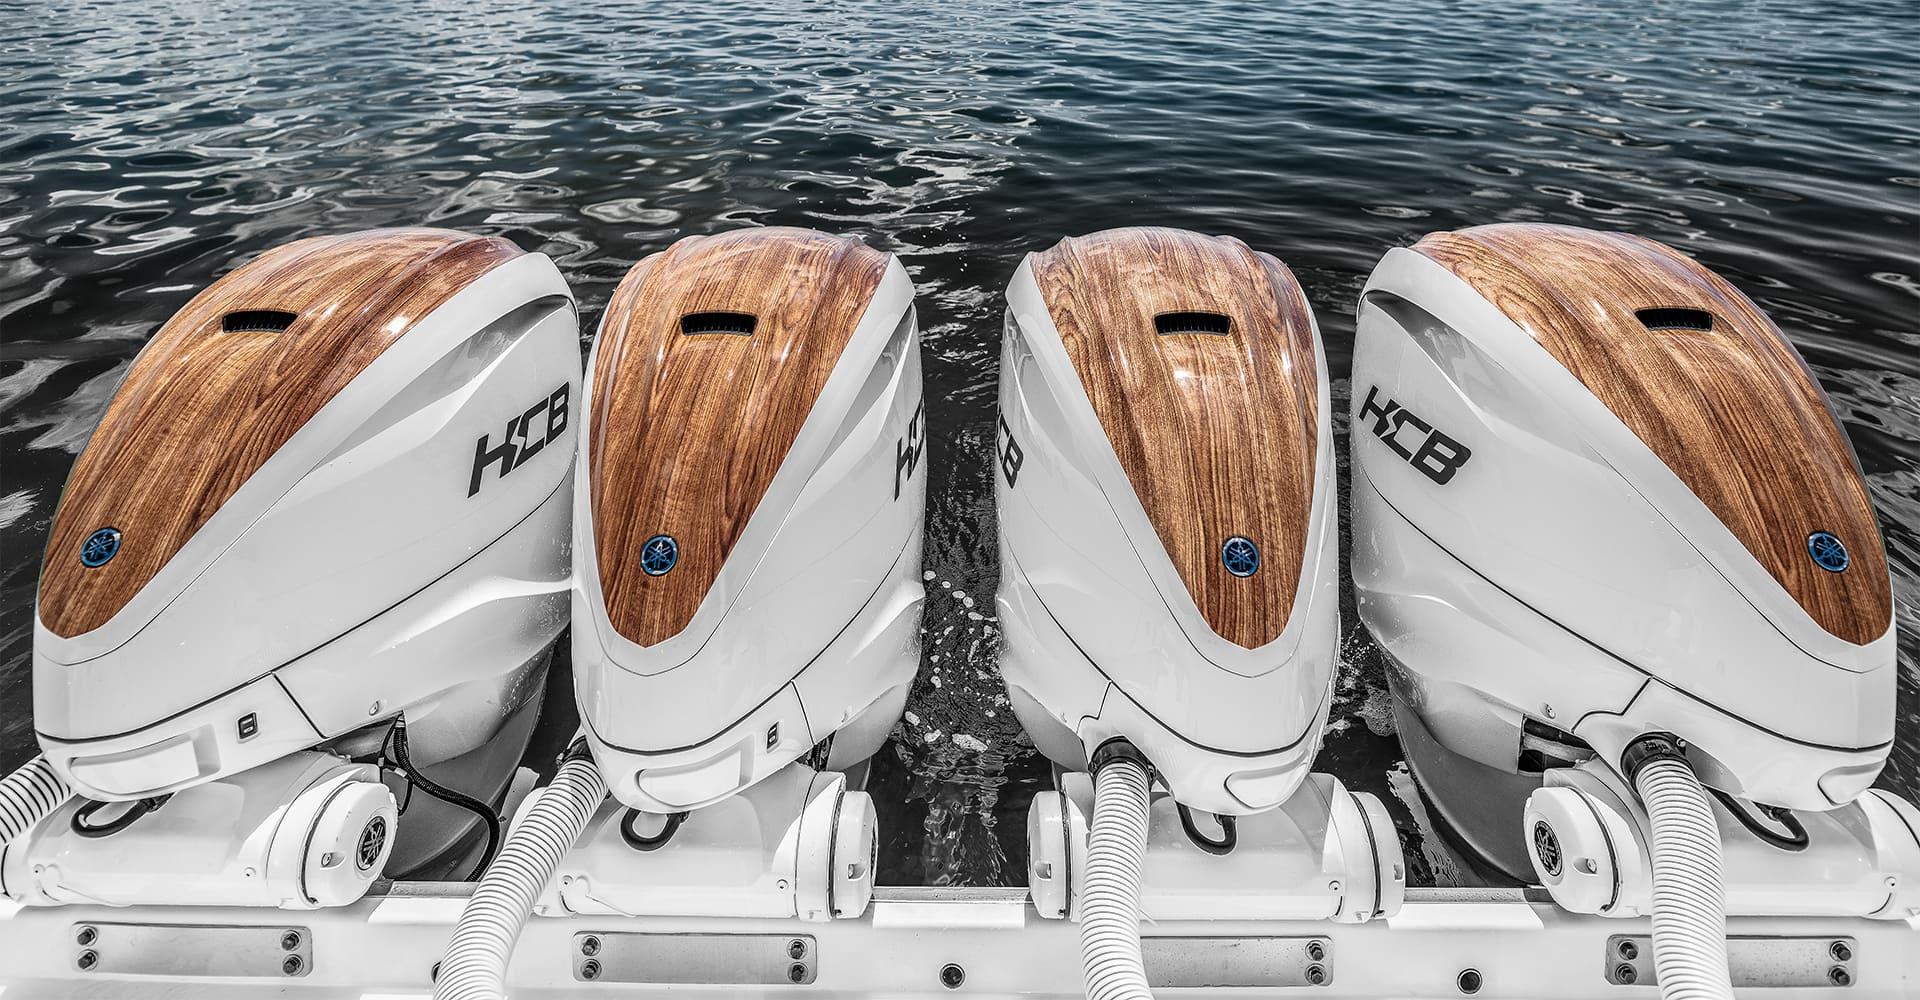 Yamaha-Wood0Grain-Outboards